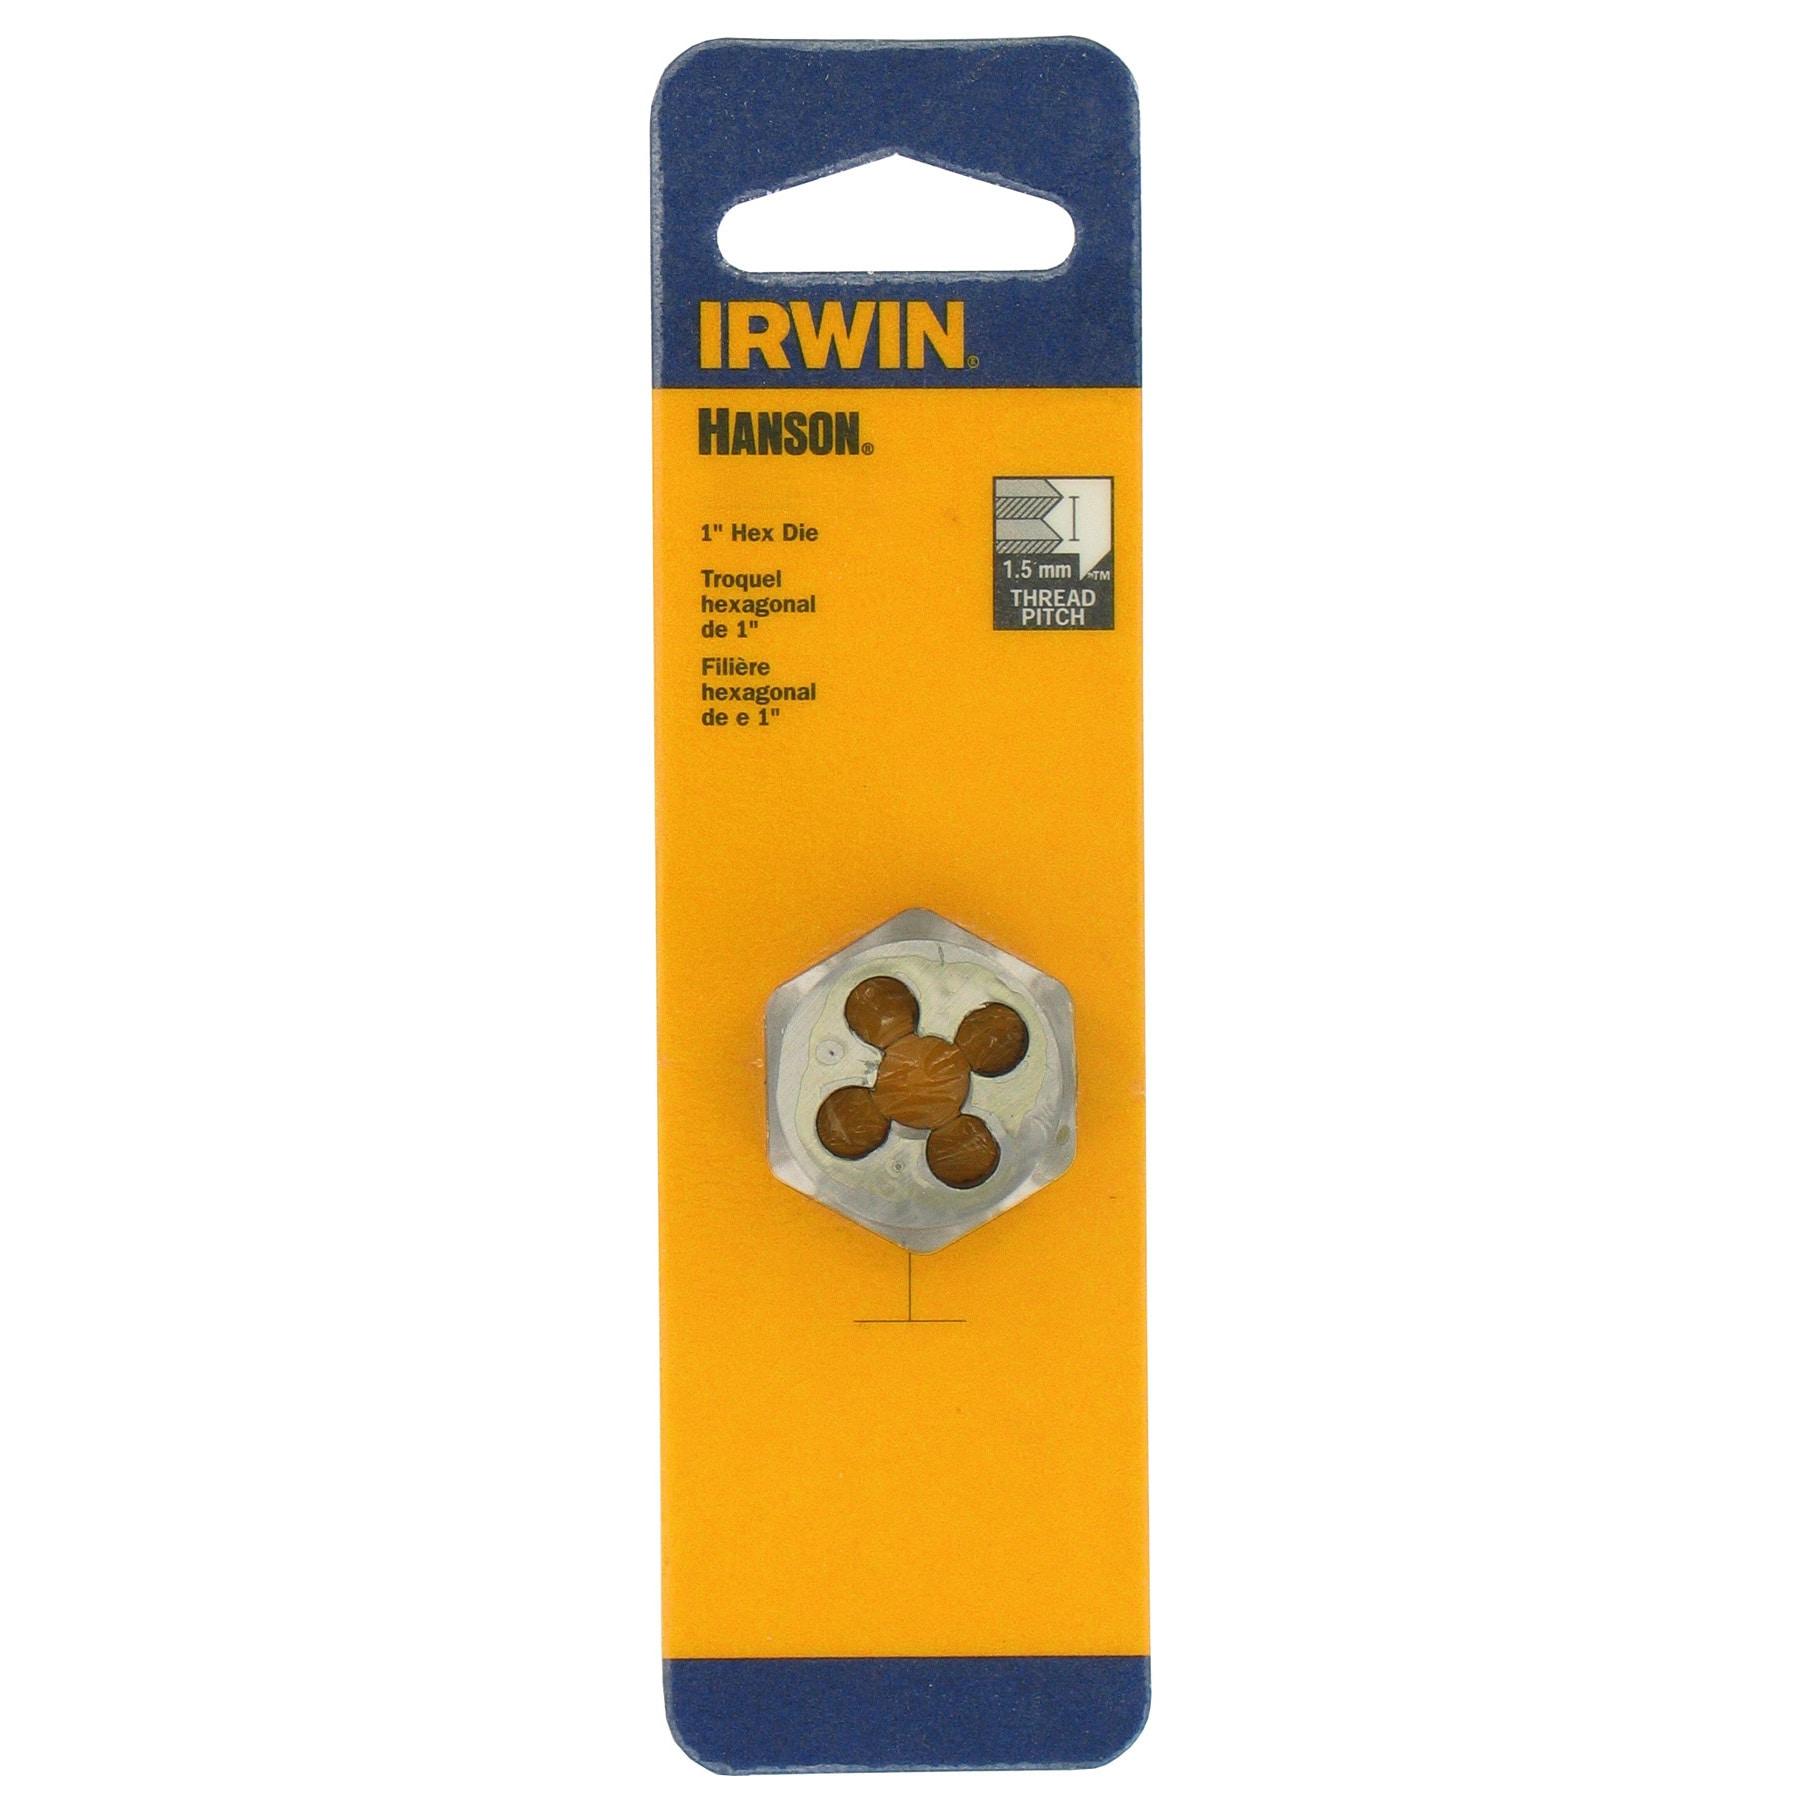 Irwin Hanson 9742 1 12mm-1.25 Hexagon Metric Die